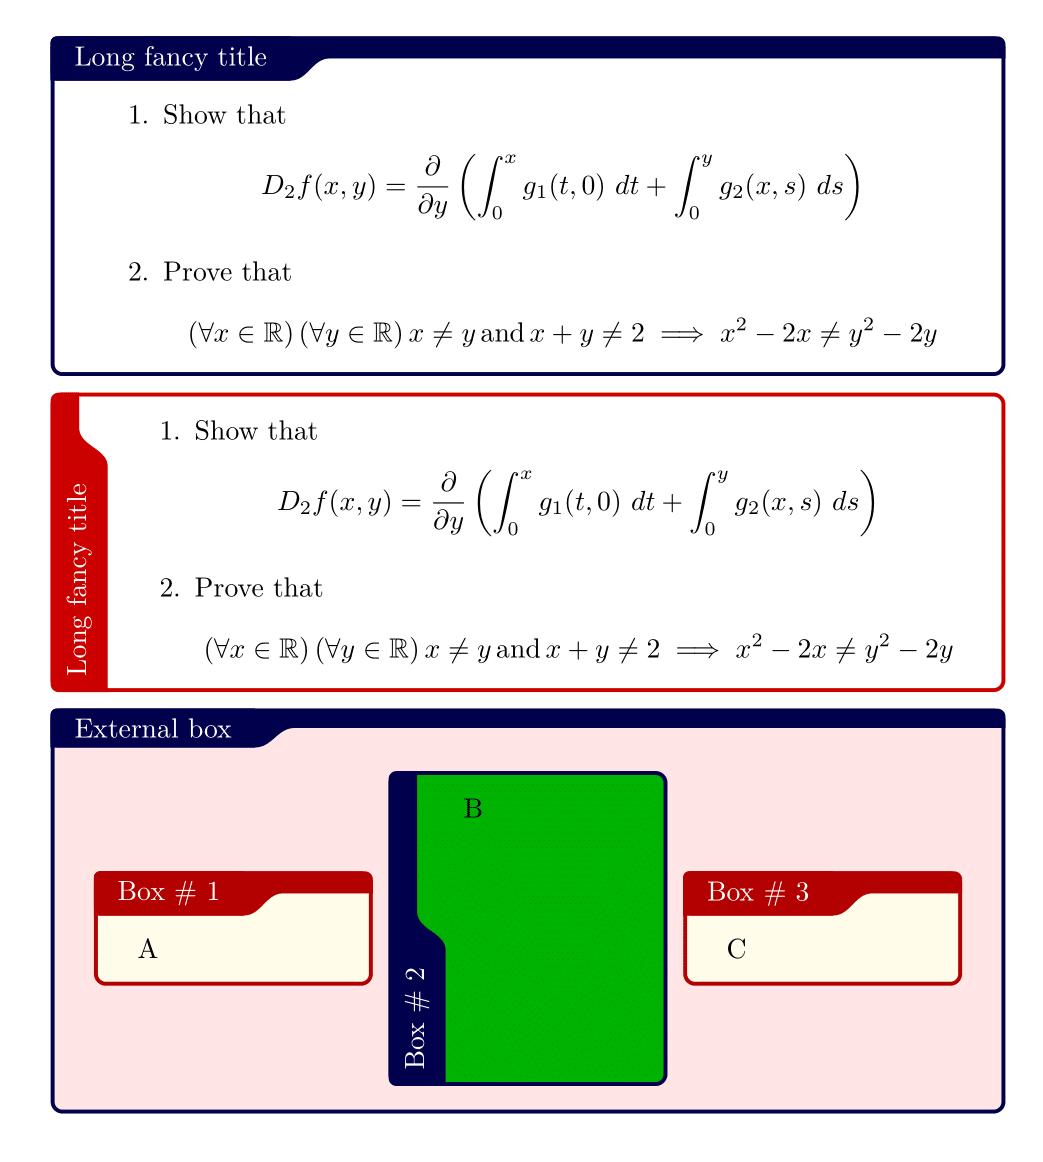 tcolorbox 定制样式合集 标题横竖排版